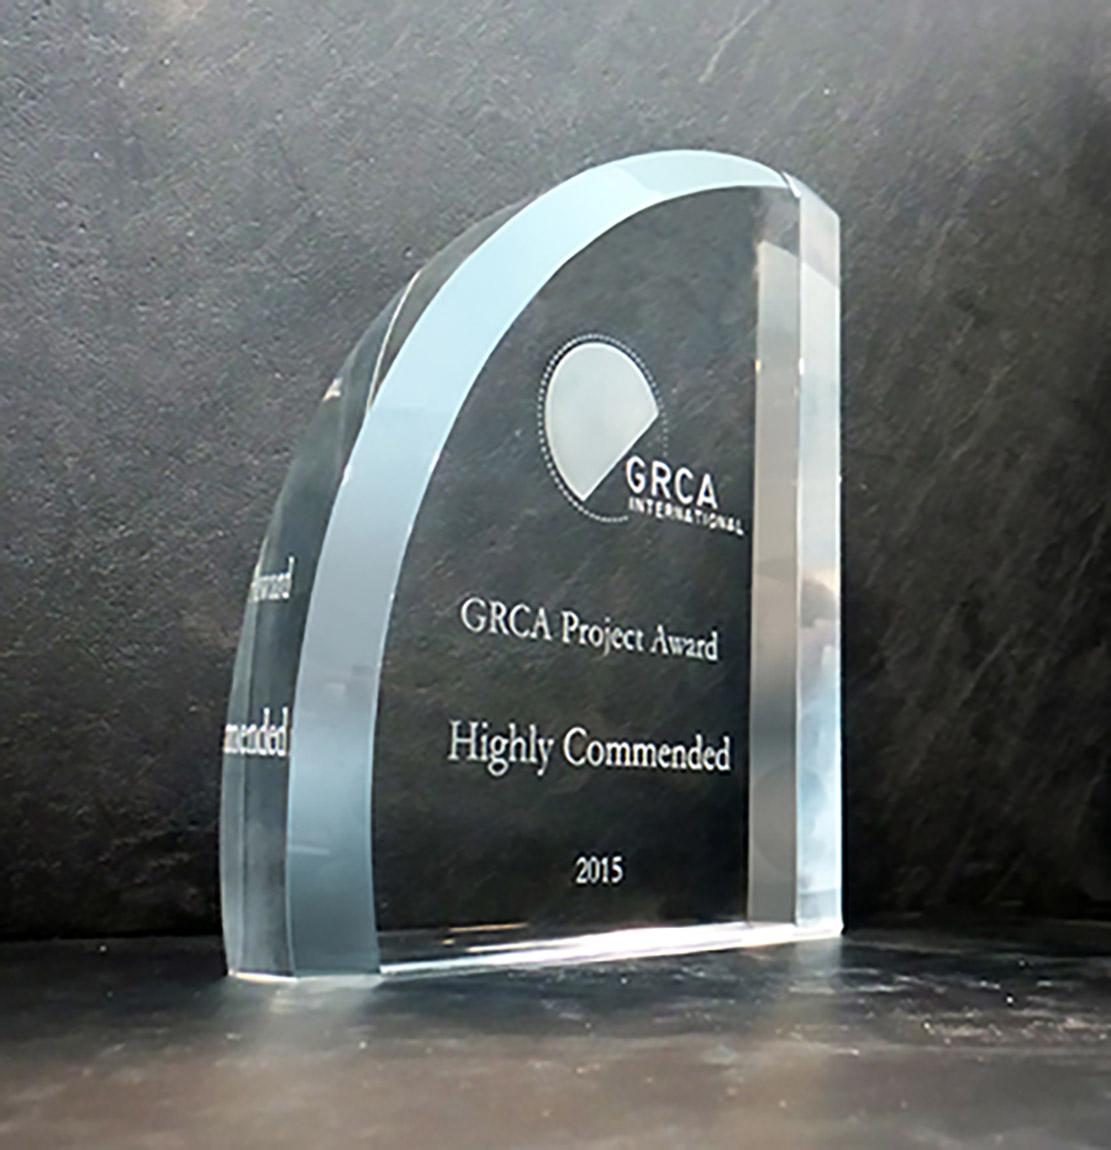 Fibrobeton 5th Prize From World GRC Manufacturers To Fibrobeton